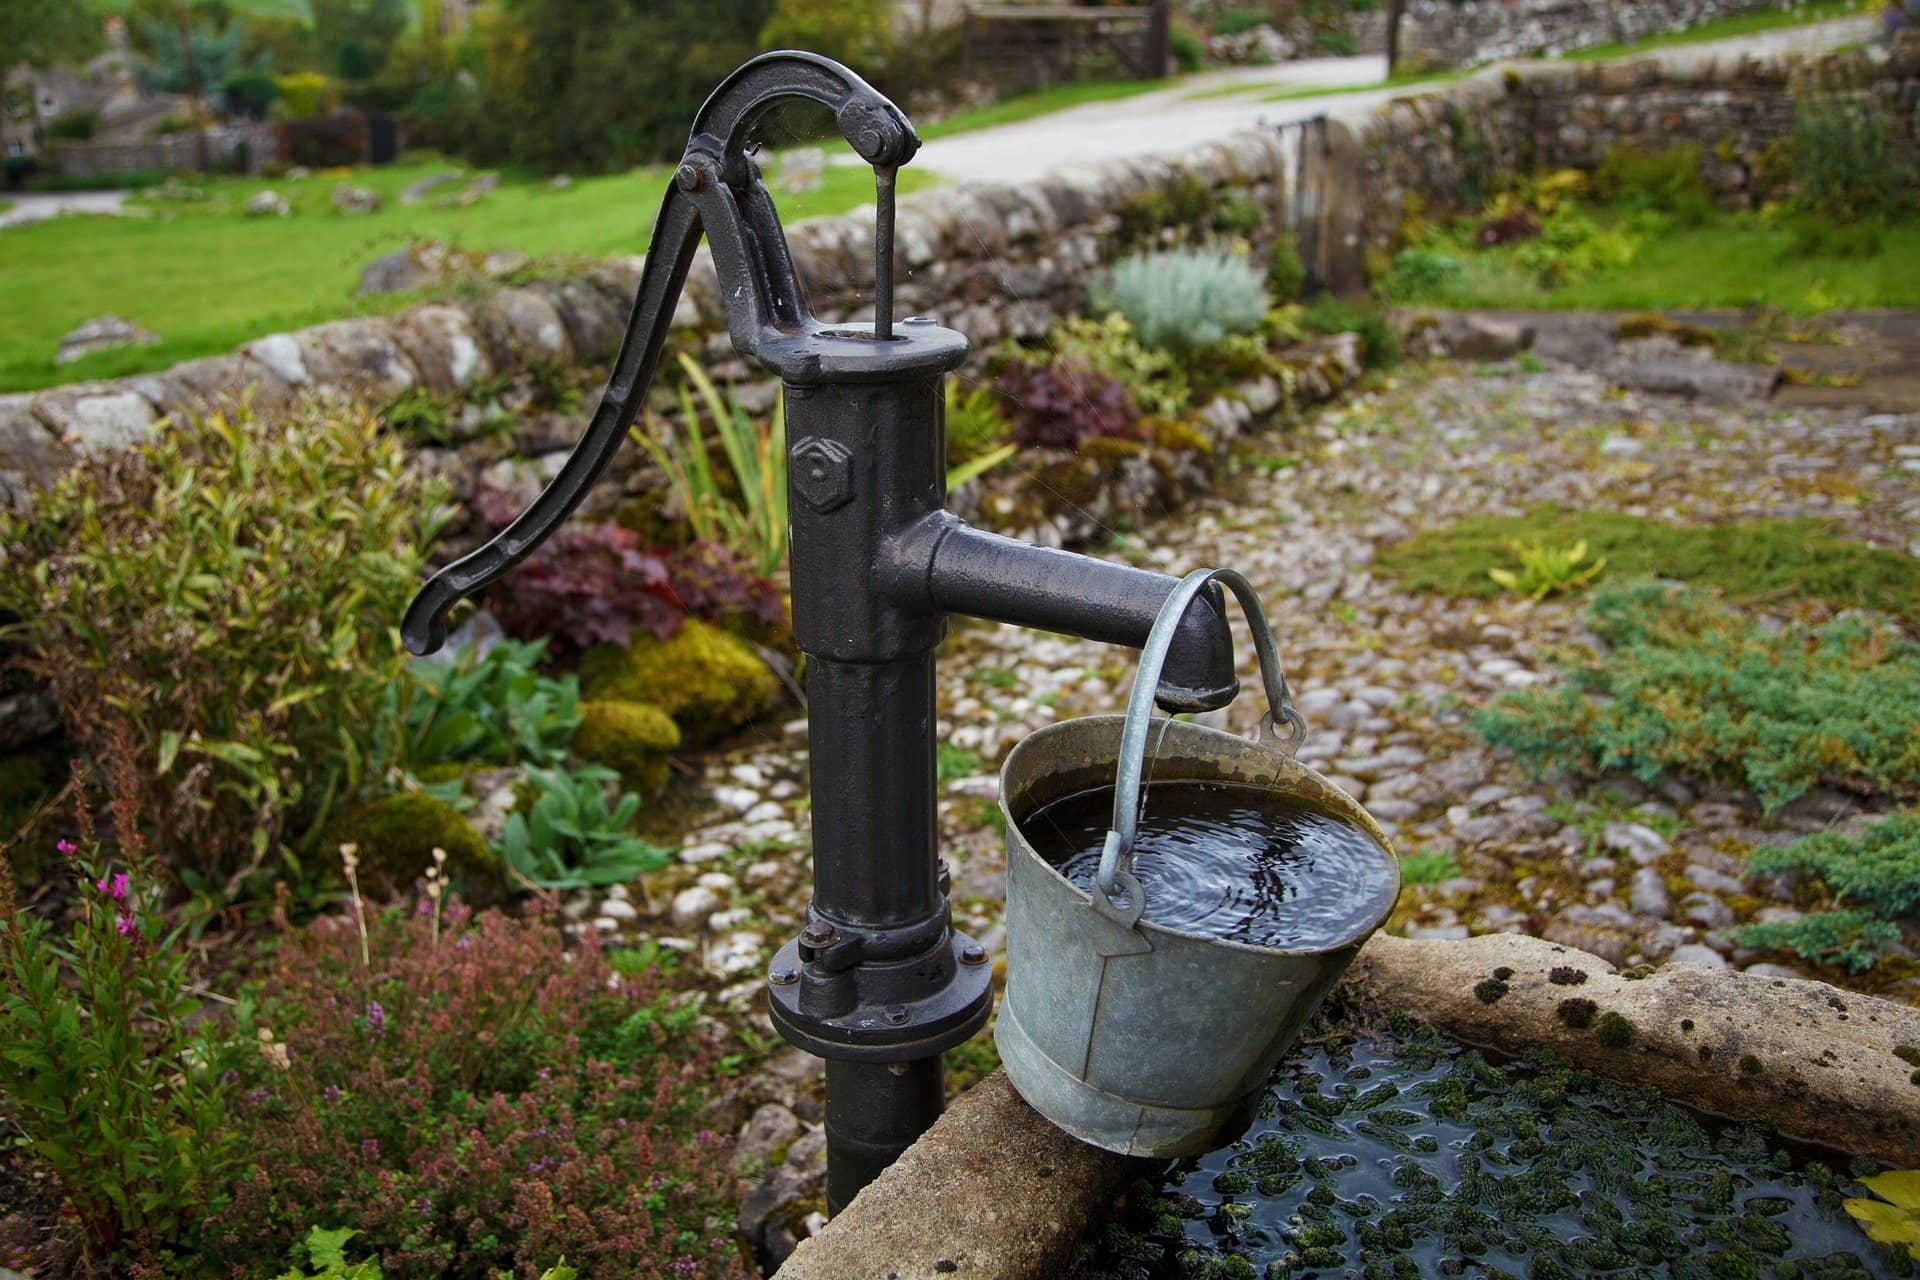 Pipa s tekočo čisto vodo. Vir: Pixabay